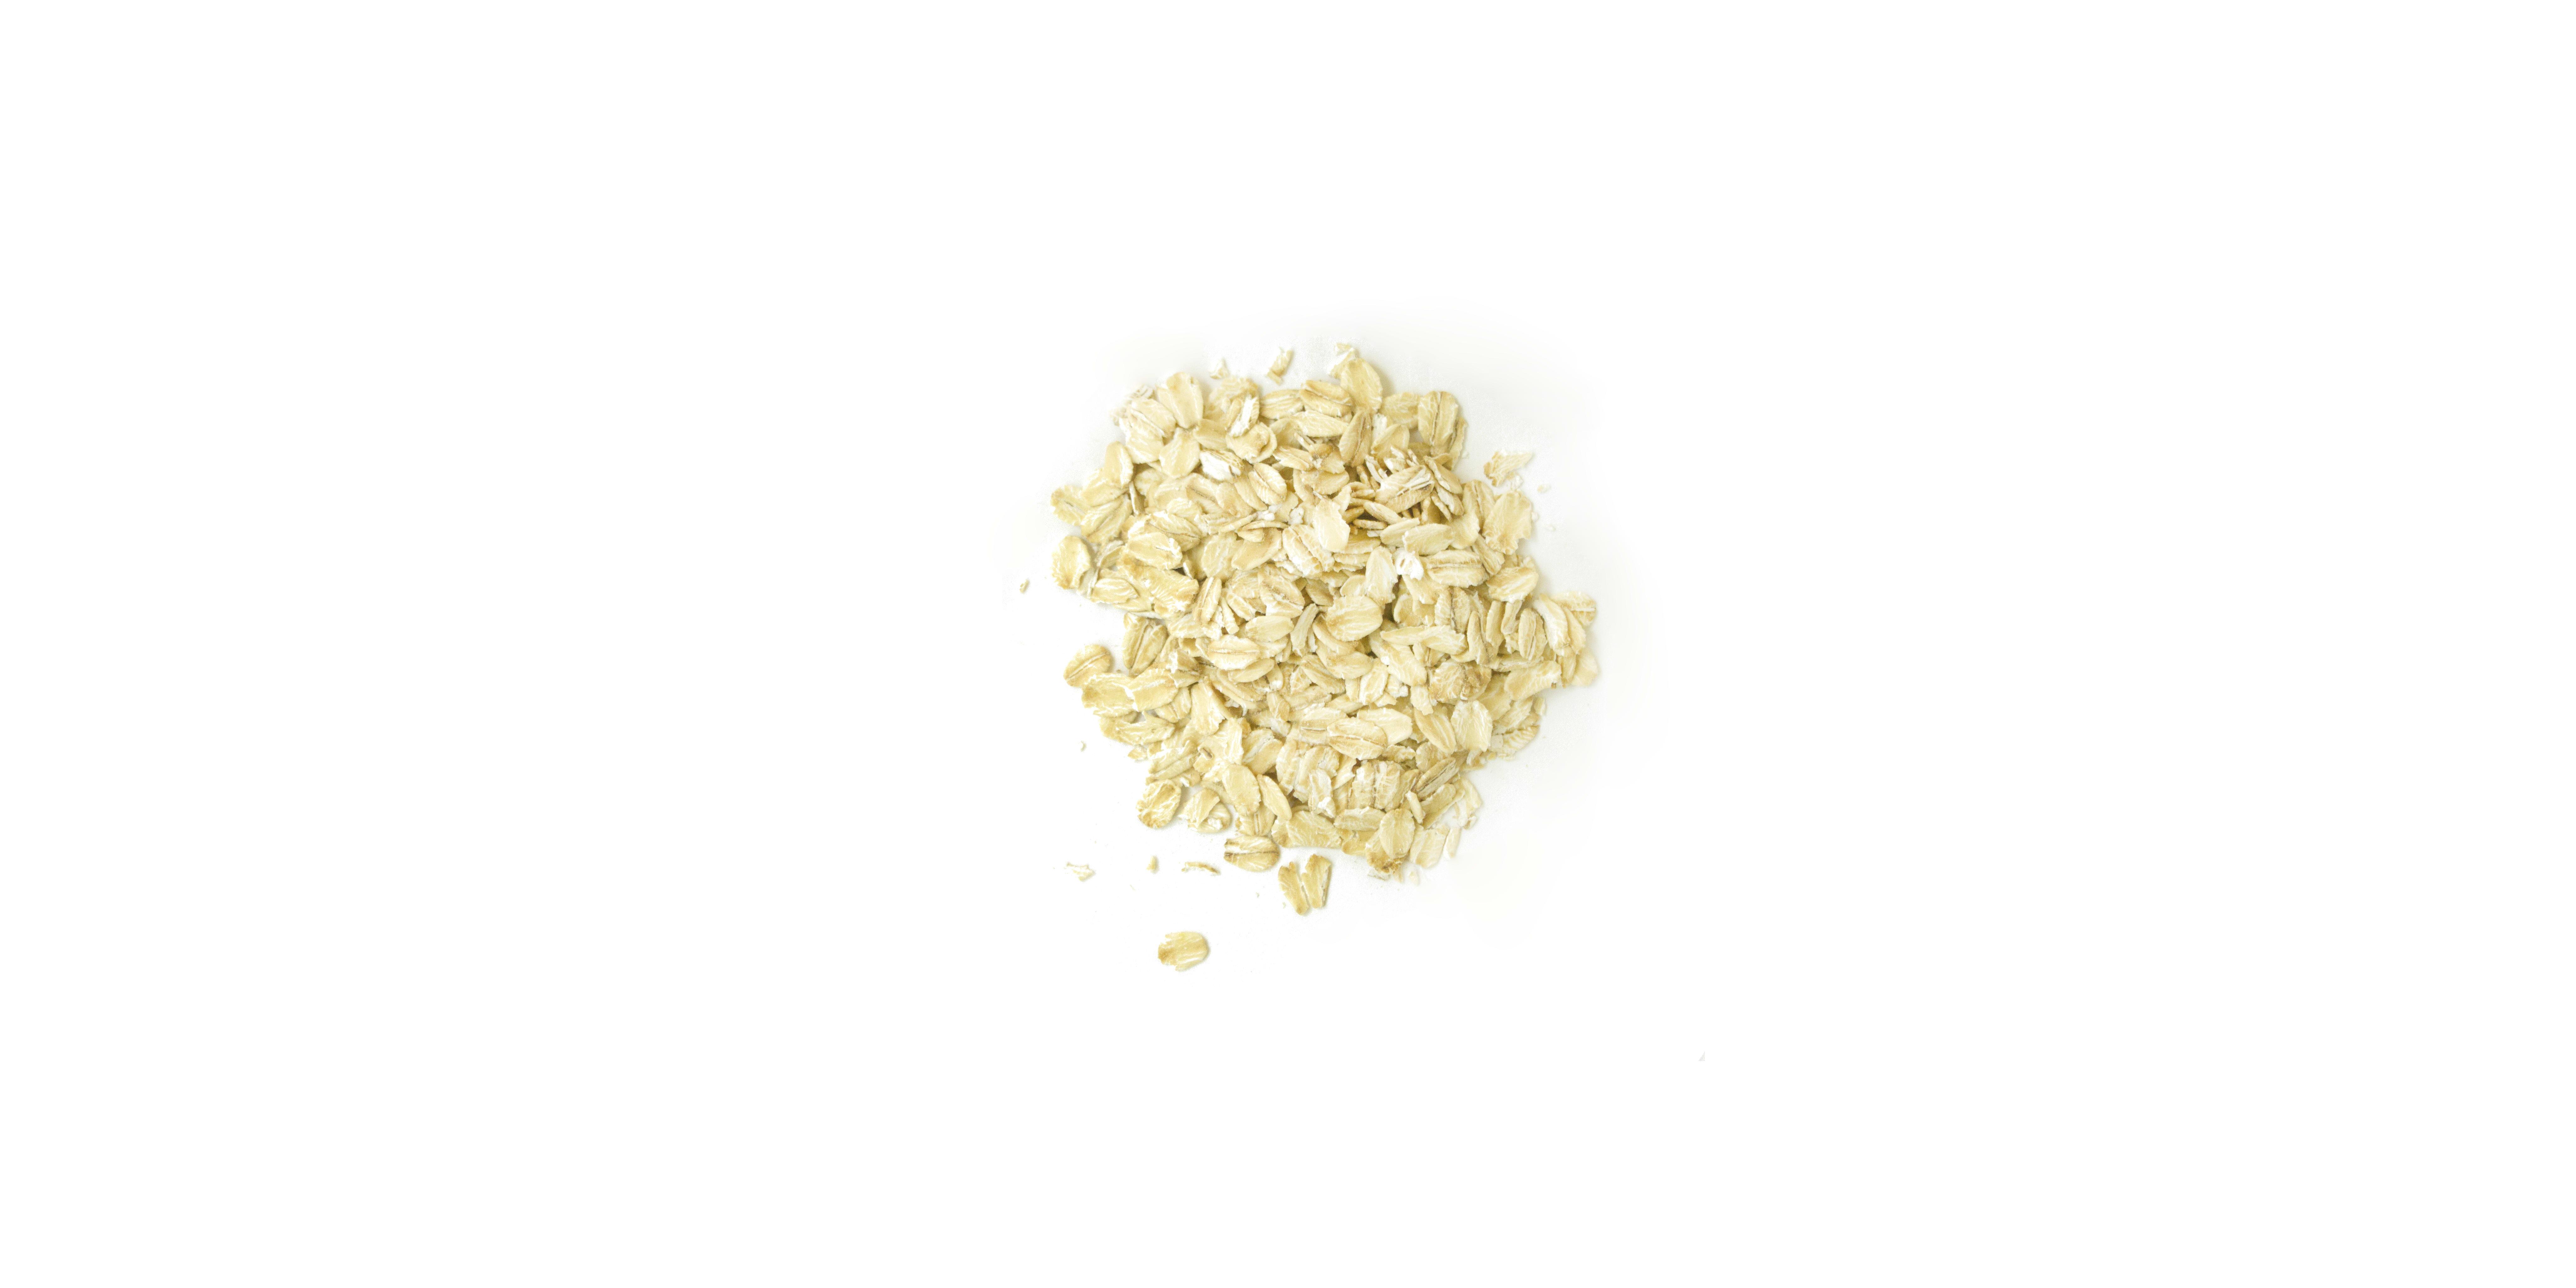 Gluten-Free Oat flour